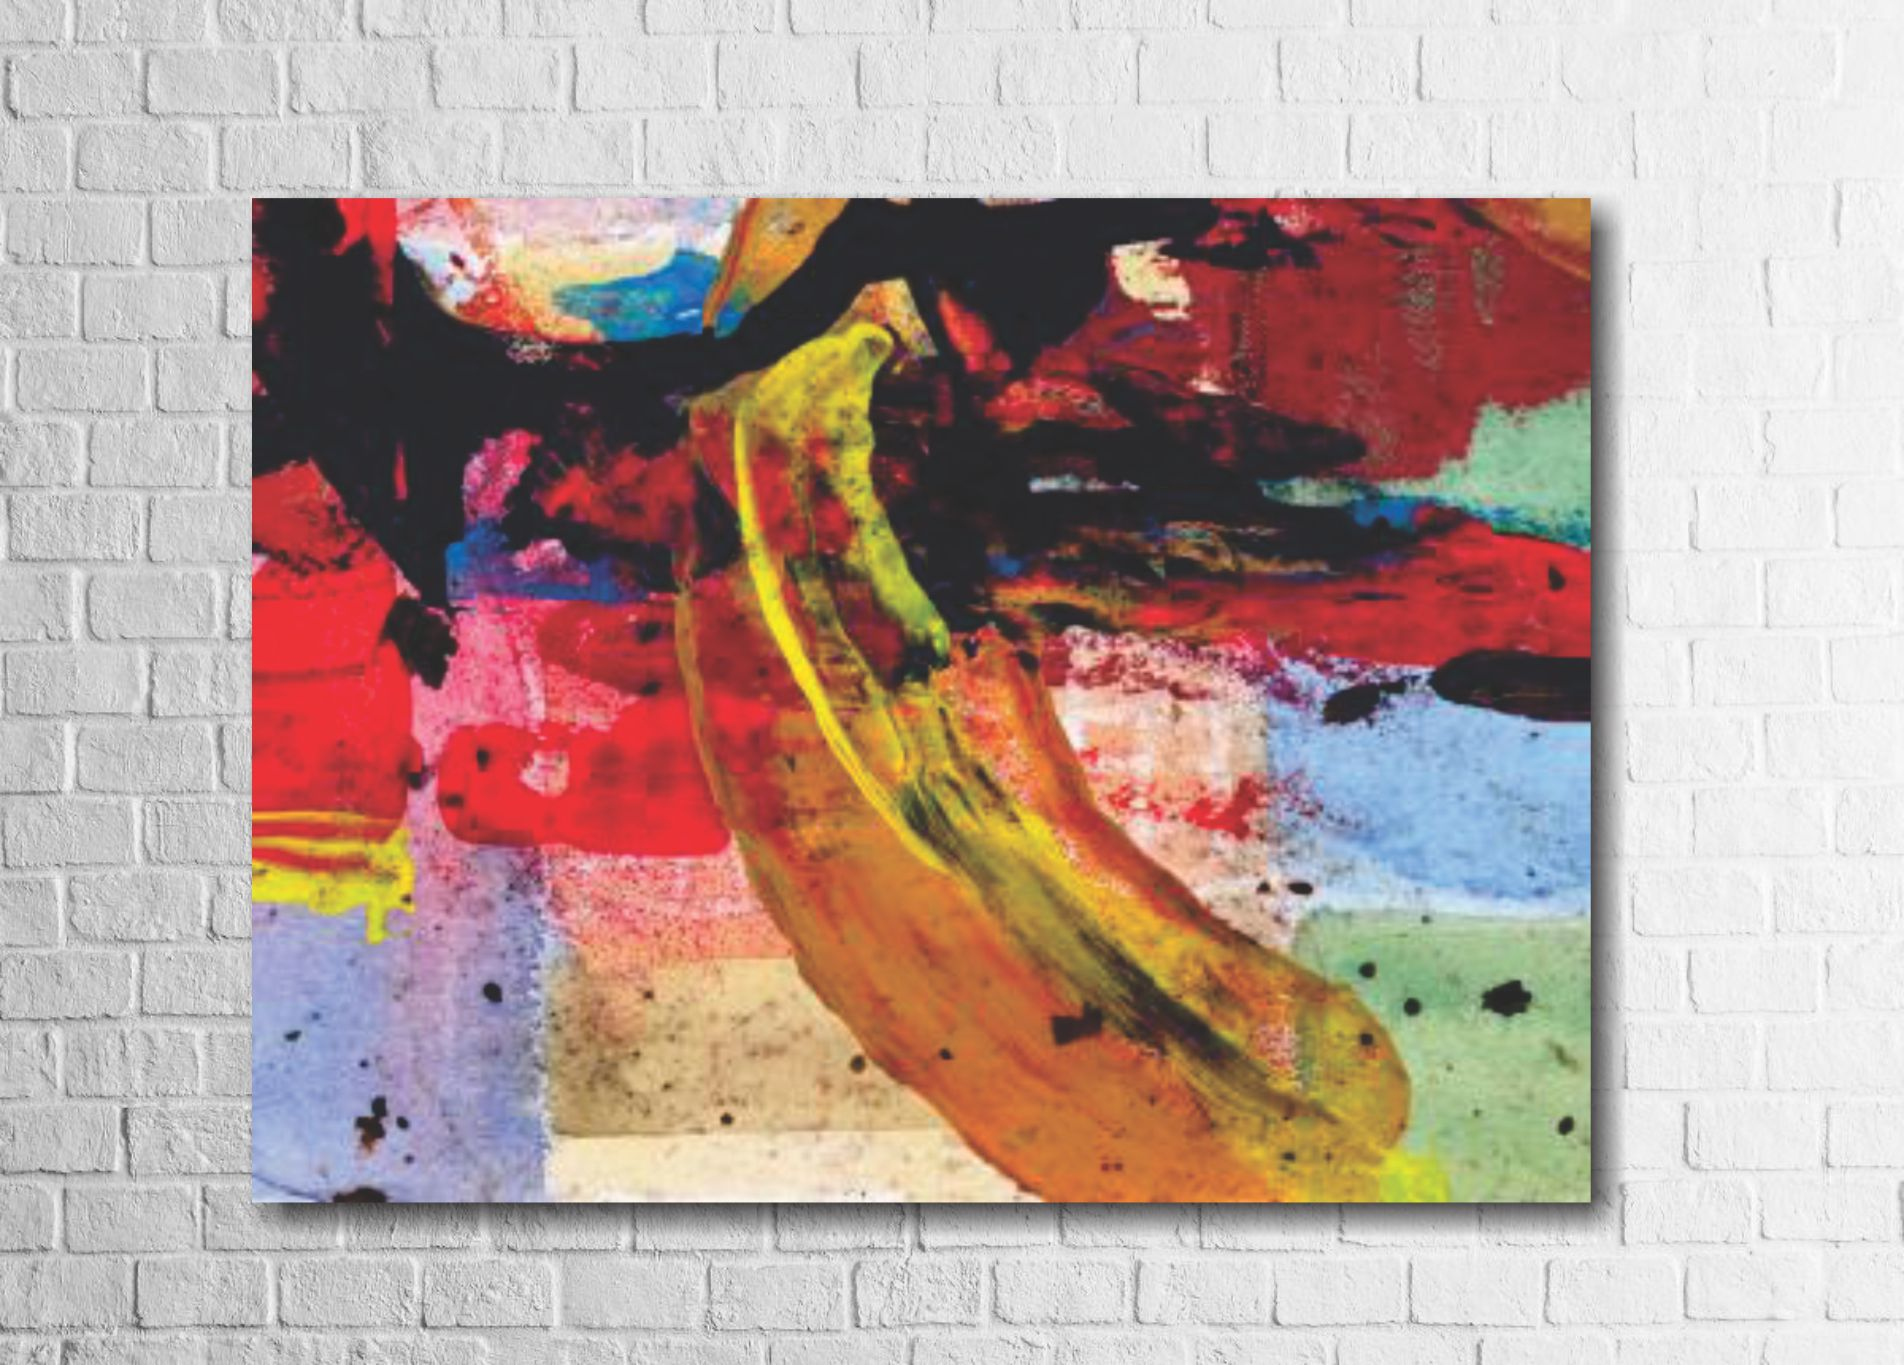 Quadro Decorativo Abstrato Colorido 1 peça